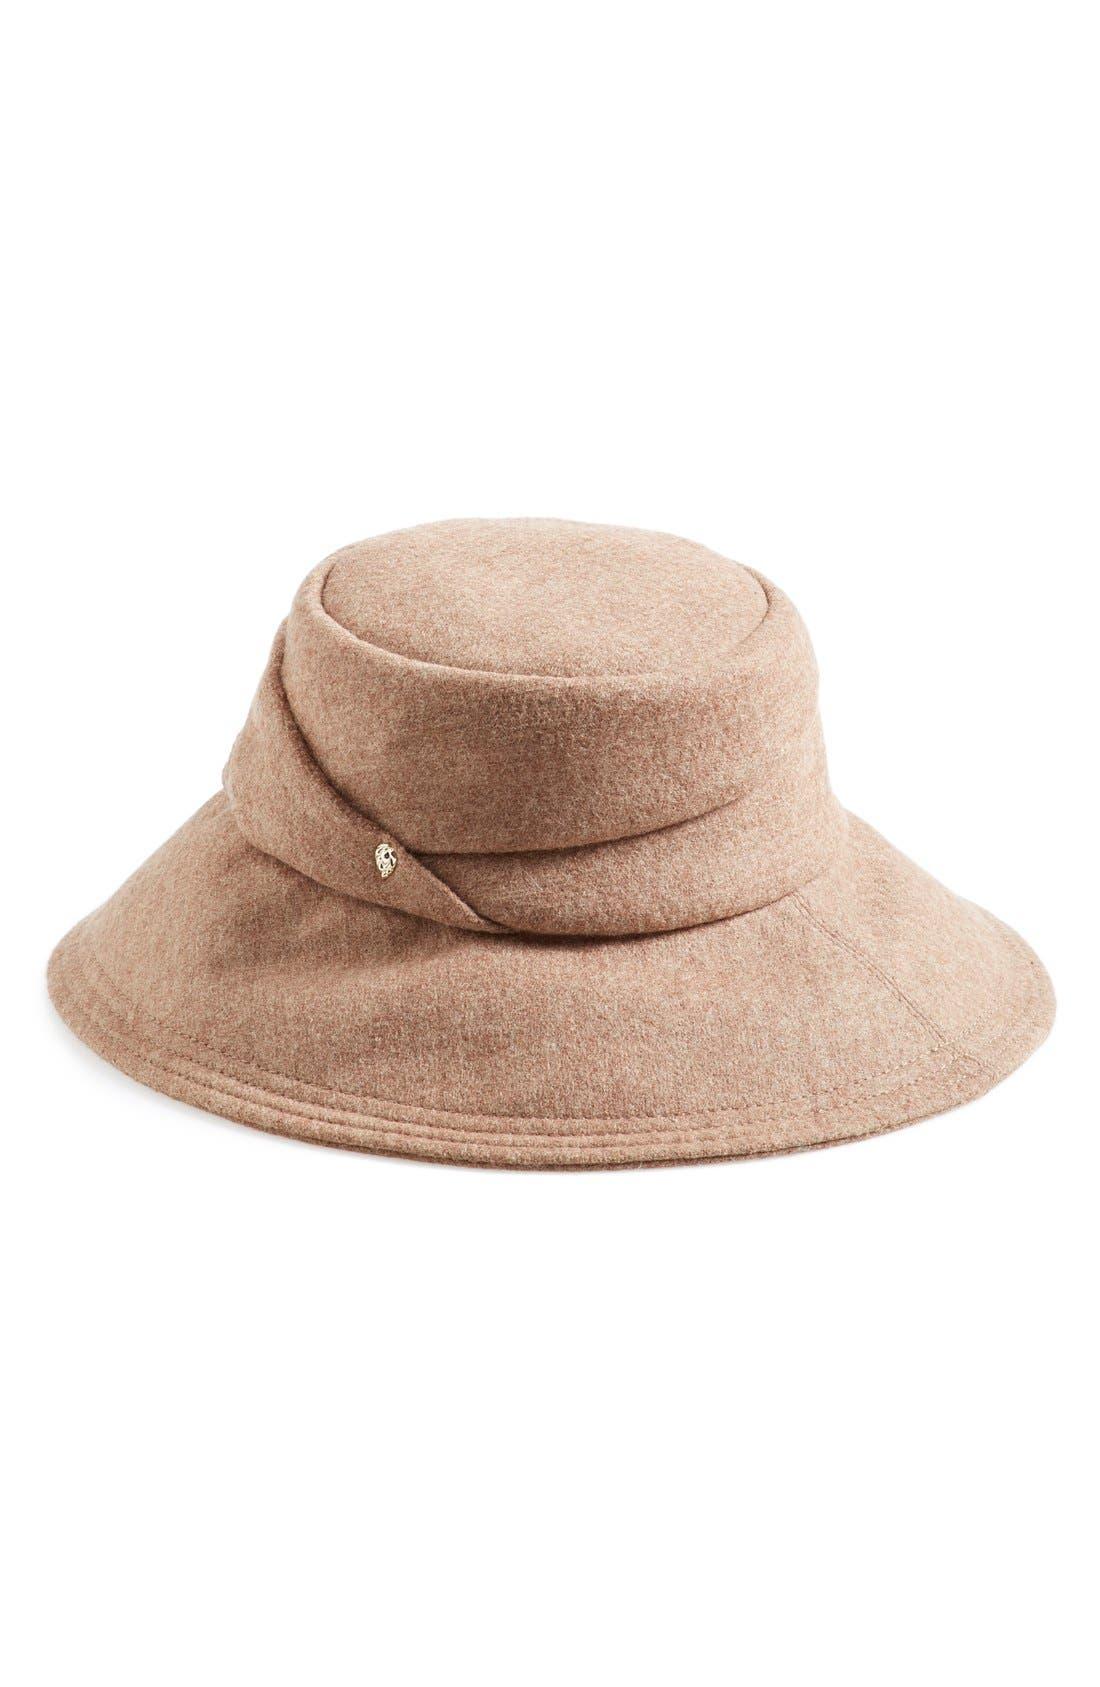 Alternate Image 1 Selected - Helen Kaminski 'Lana Dolce' Bucket Hat